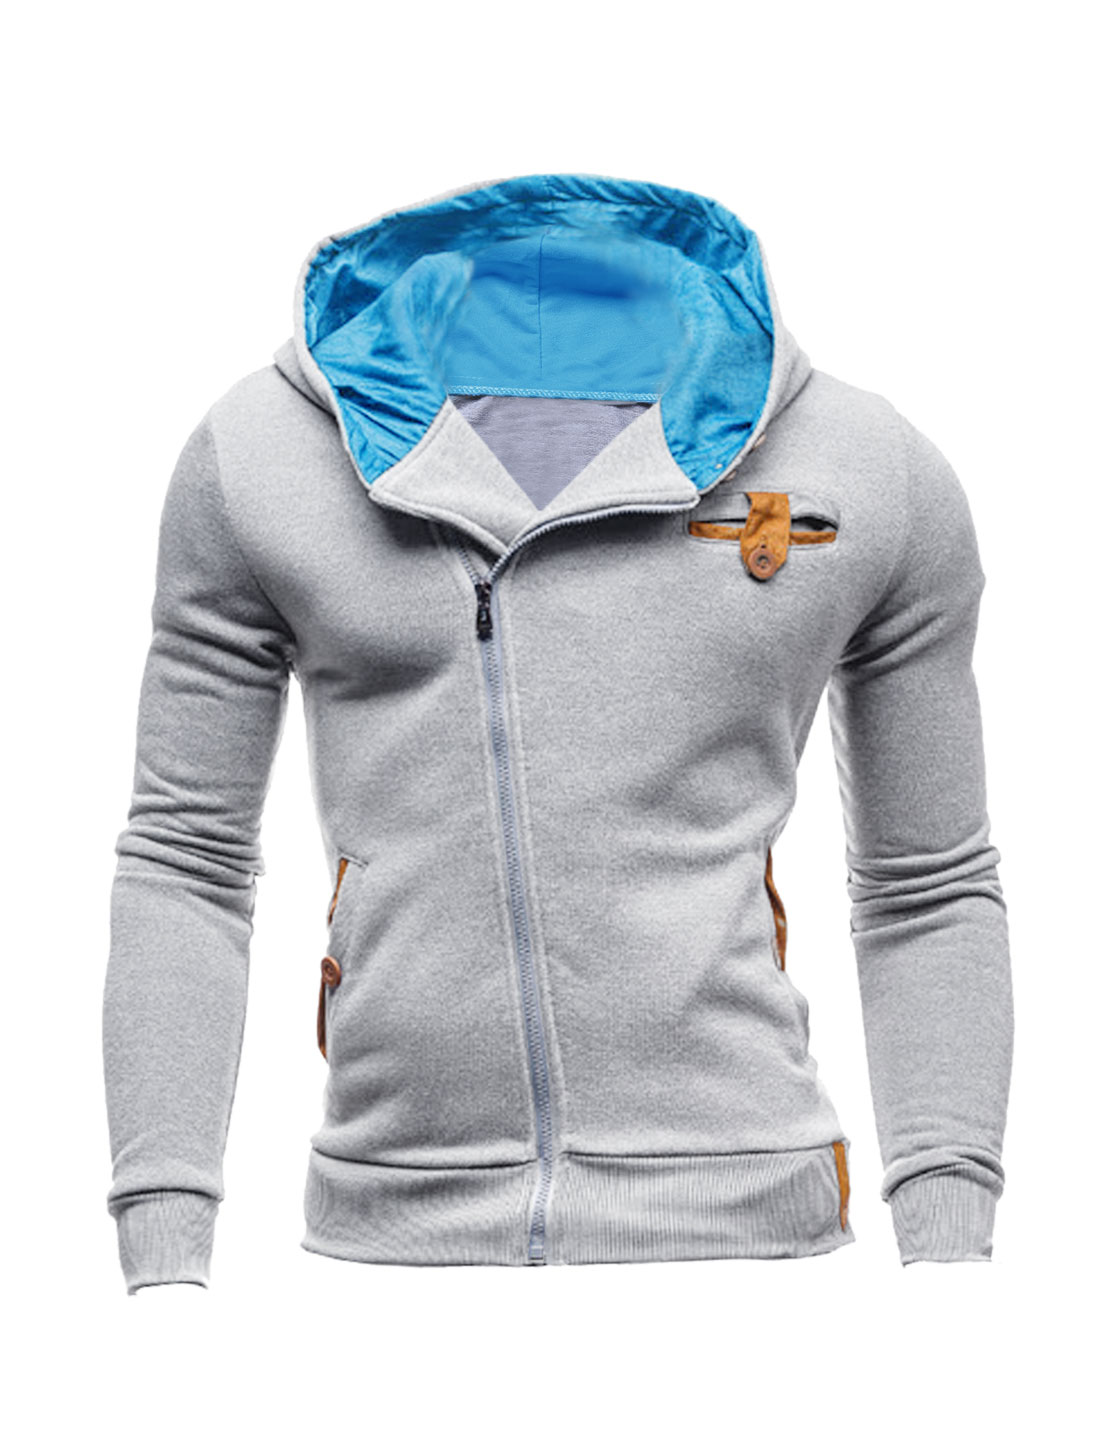 Men Long Sleeve Inclined Zipper Front Slant Pockets Hooded Jacket Light Gray M